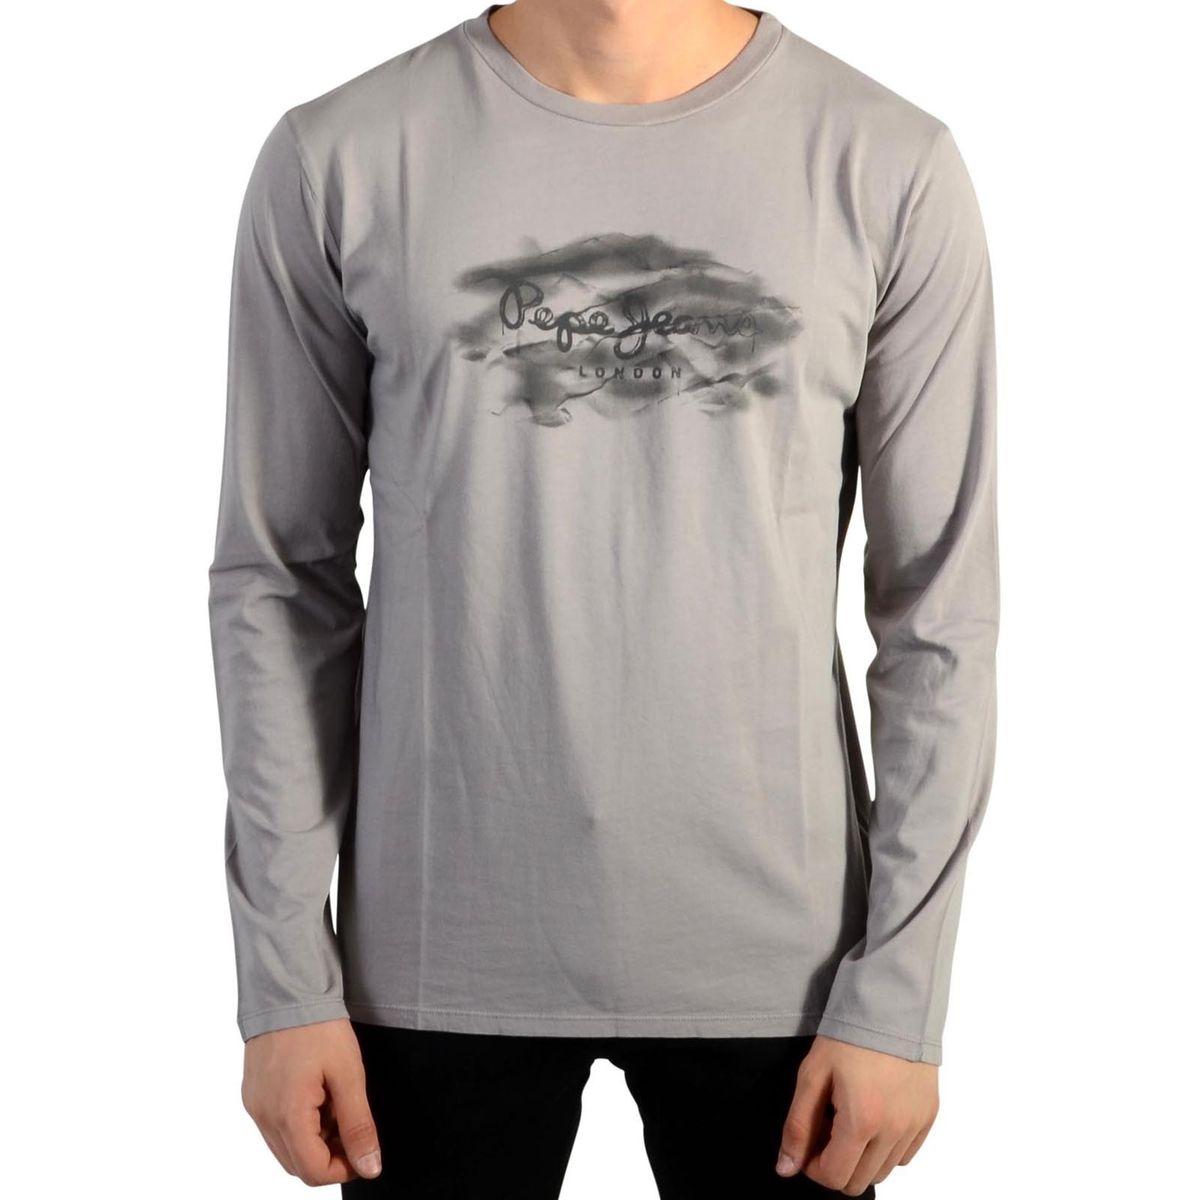 Tee Shirt Enfant Jayme JR Grey